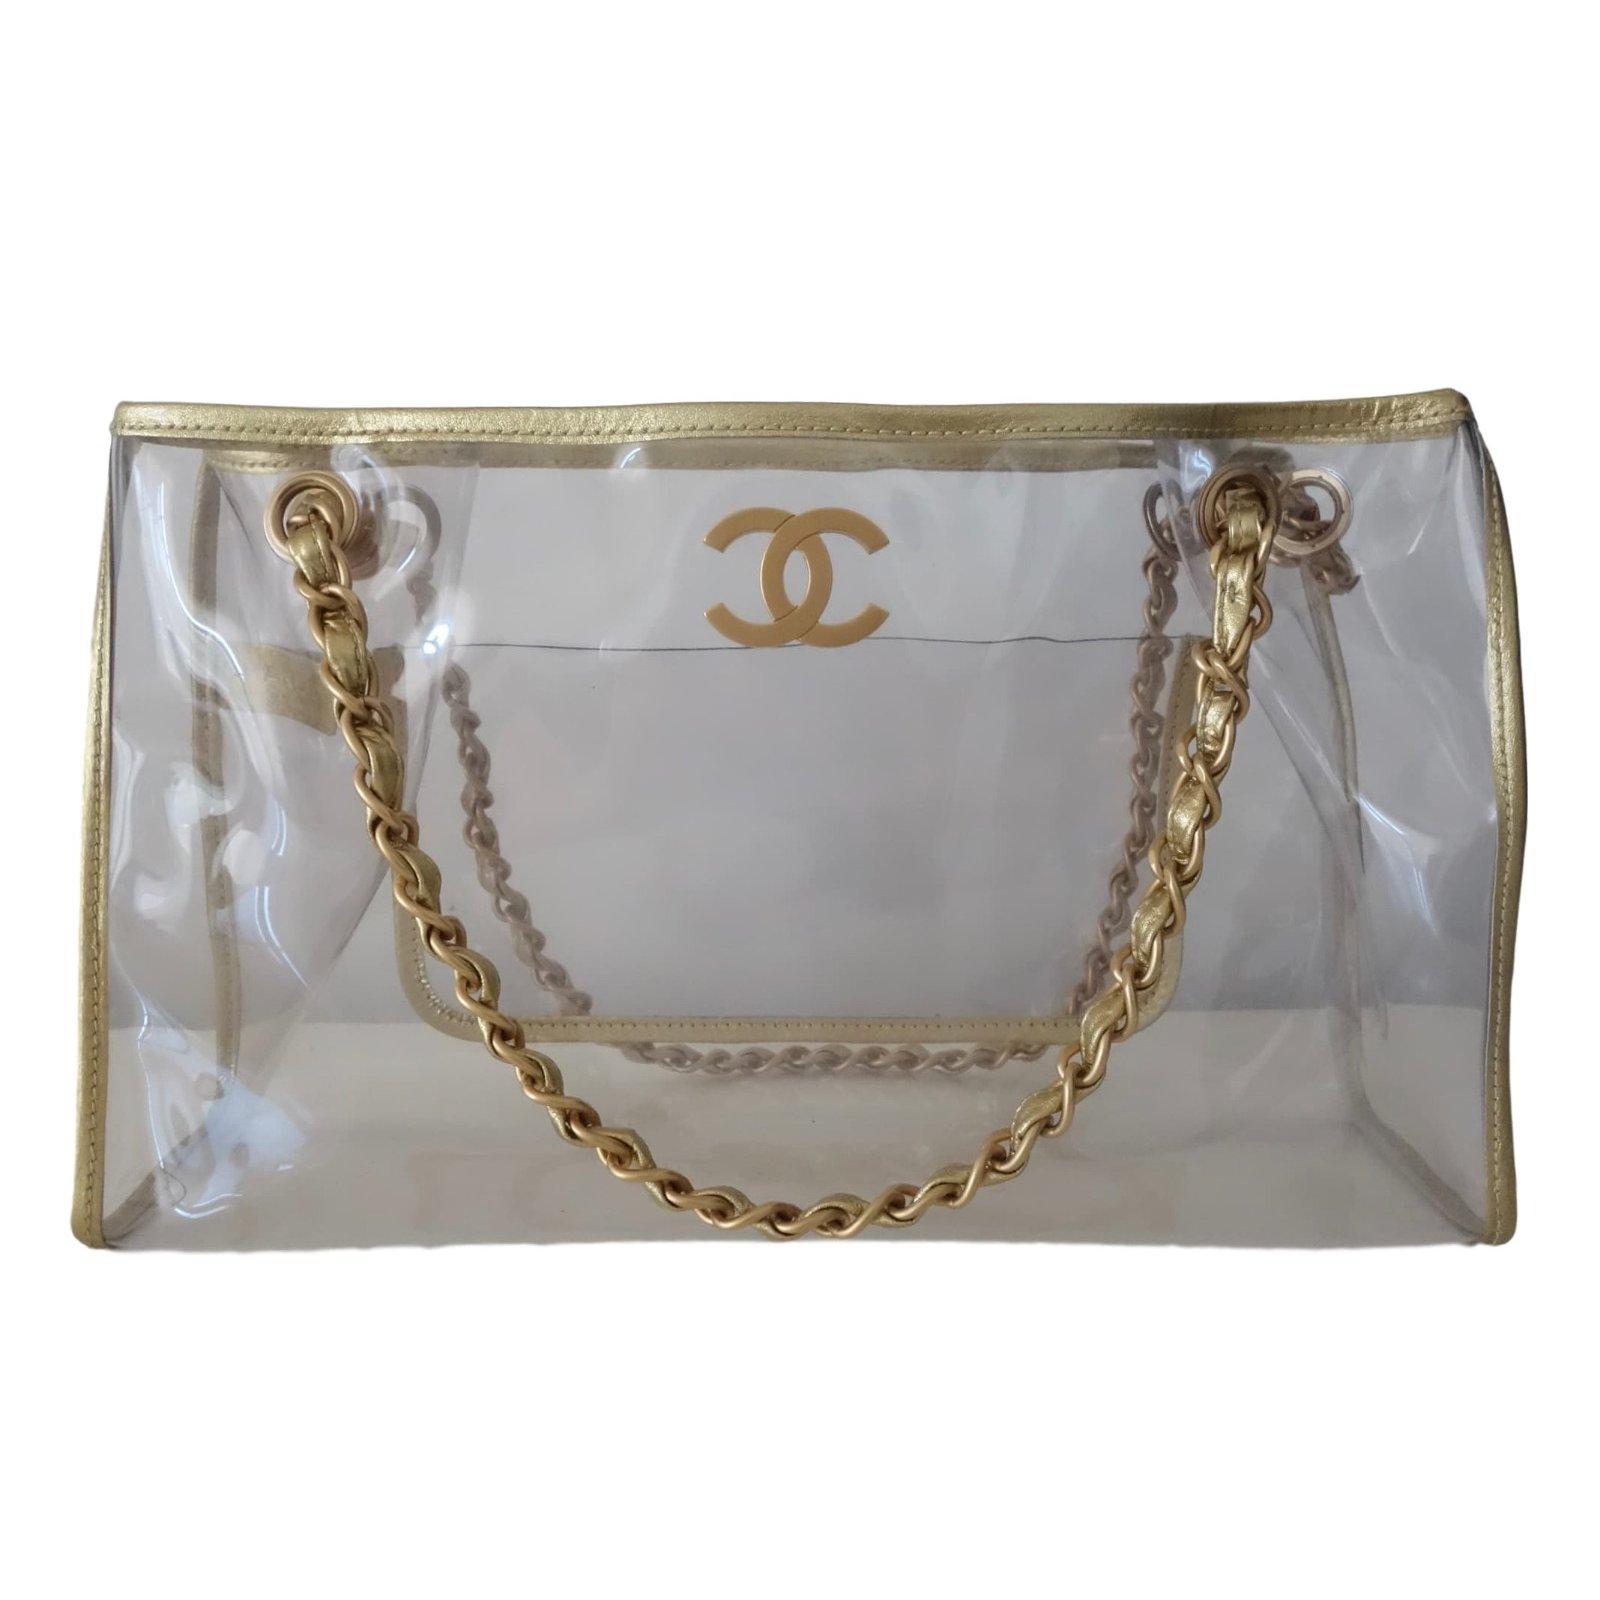 4cbc03569f5110 Chanel Handbags Handbags Plastic Golden ref.44614 - Joli Closet